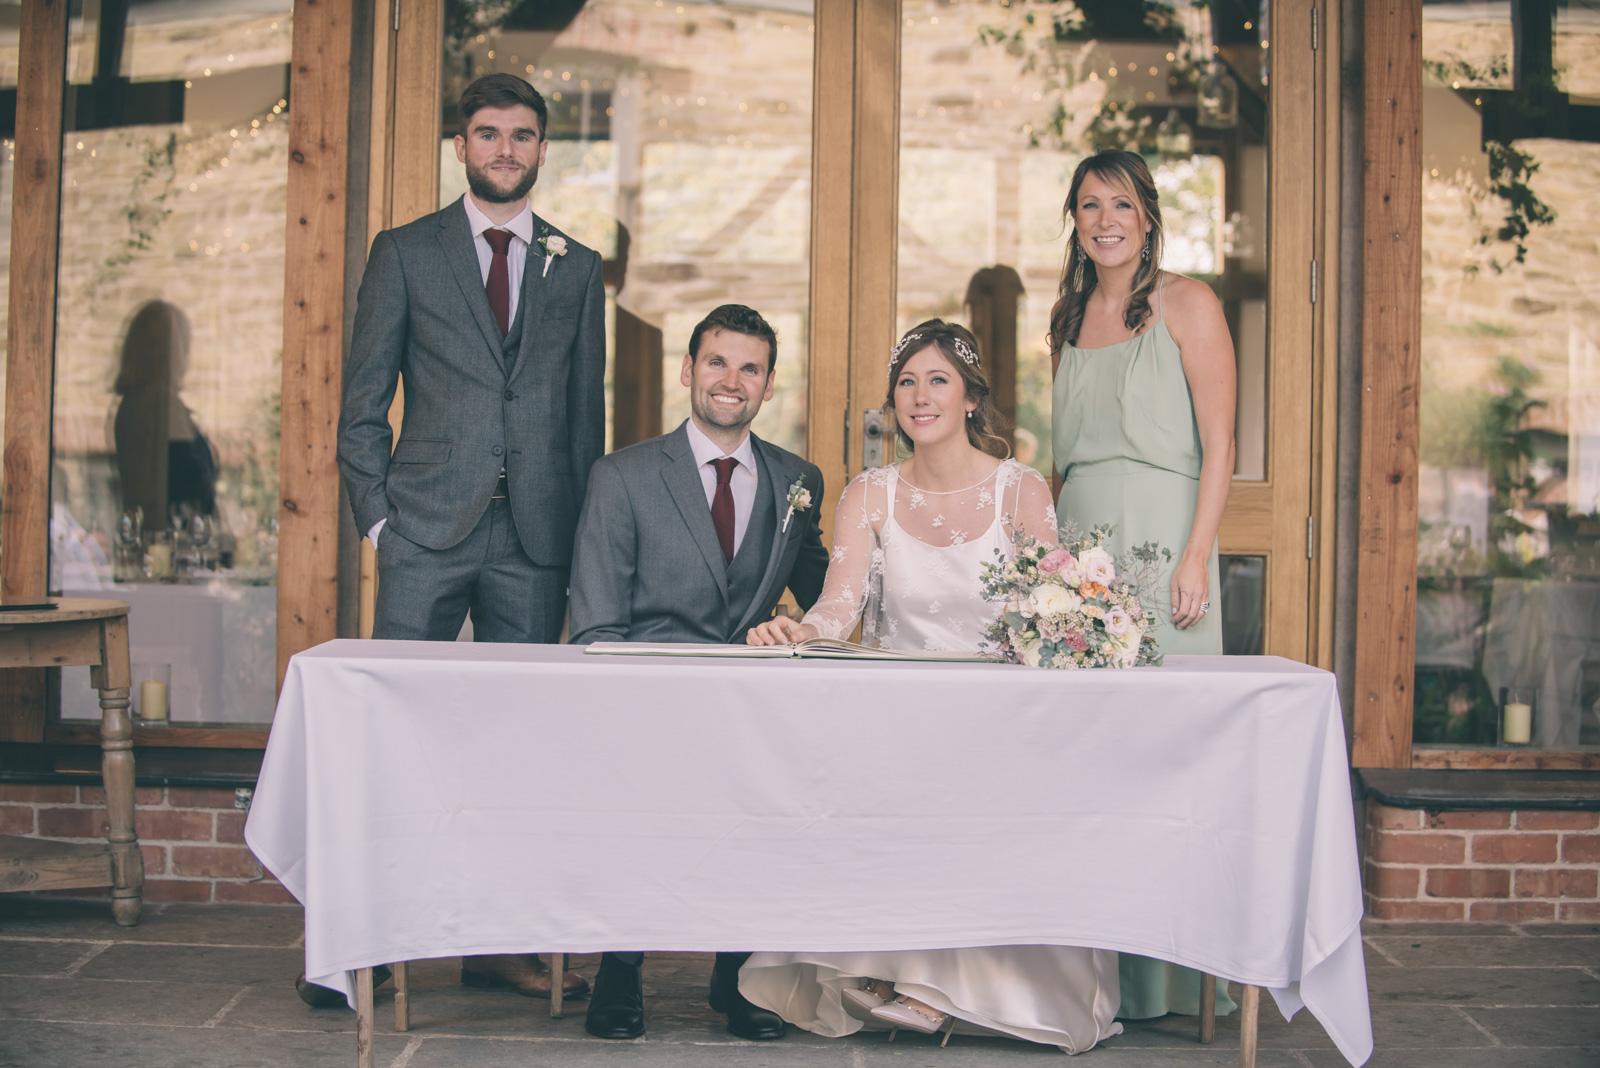 nancarrow-wedding-photography-73.jpg